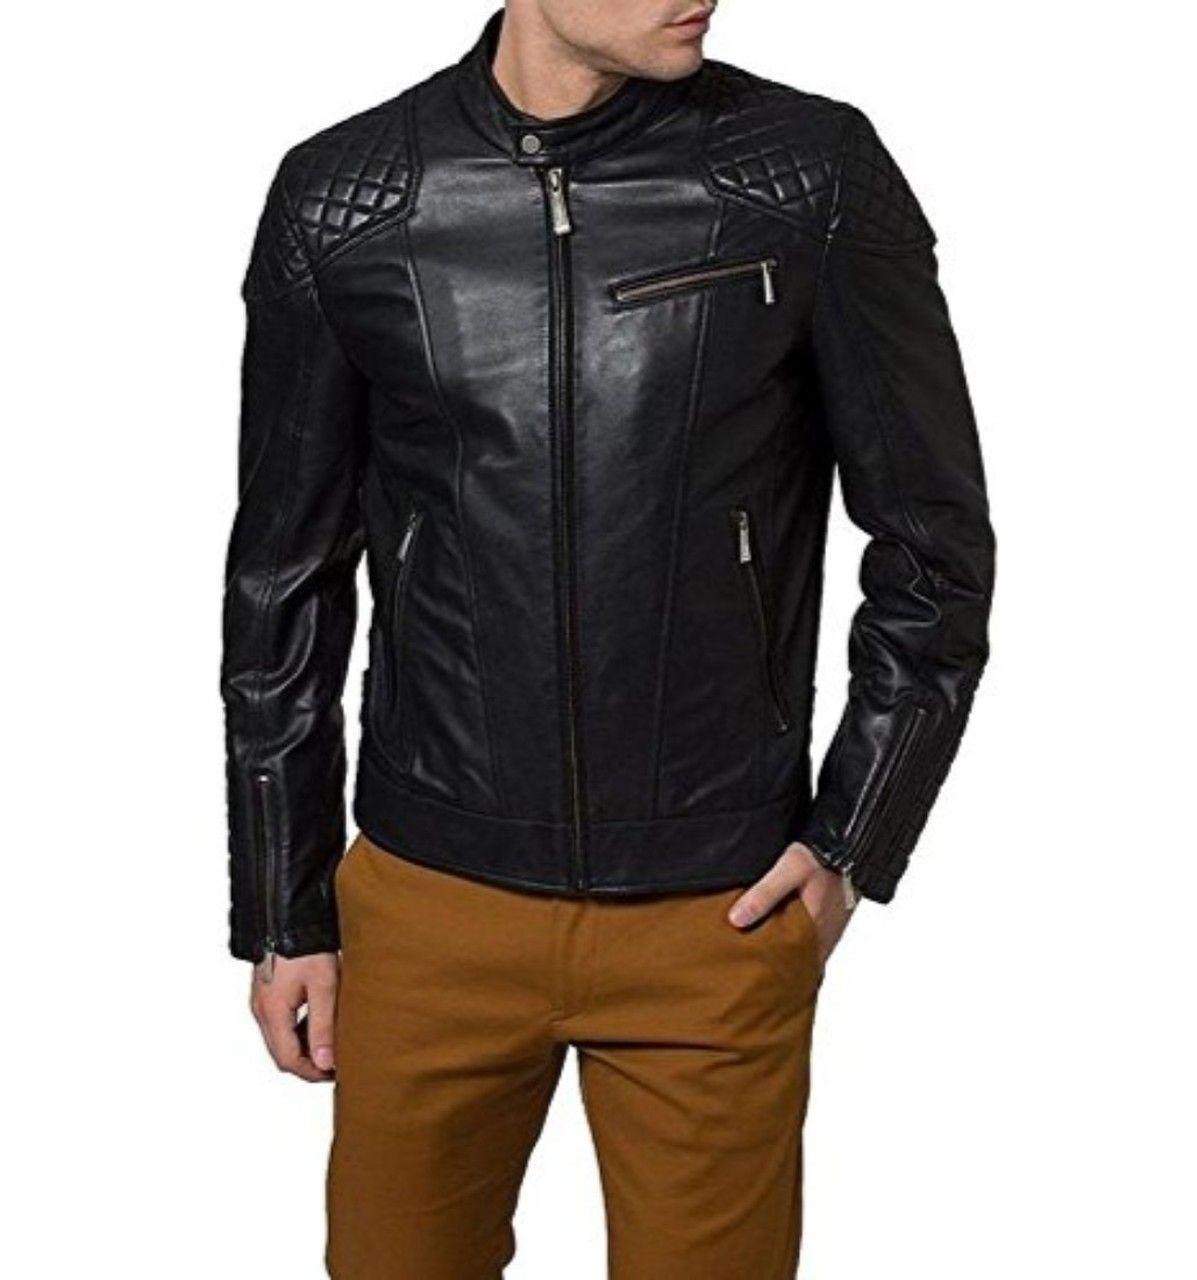 New Handmade Men S Black Quilted Style Biker Leather Jacket Mens Leather Jacket Biker Leather Jacket Brands Leather Jacket Men [ 1280 x 1197 Pixel ]